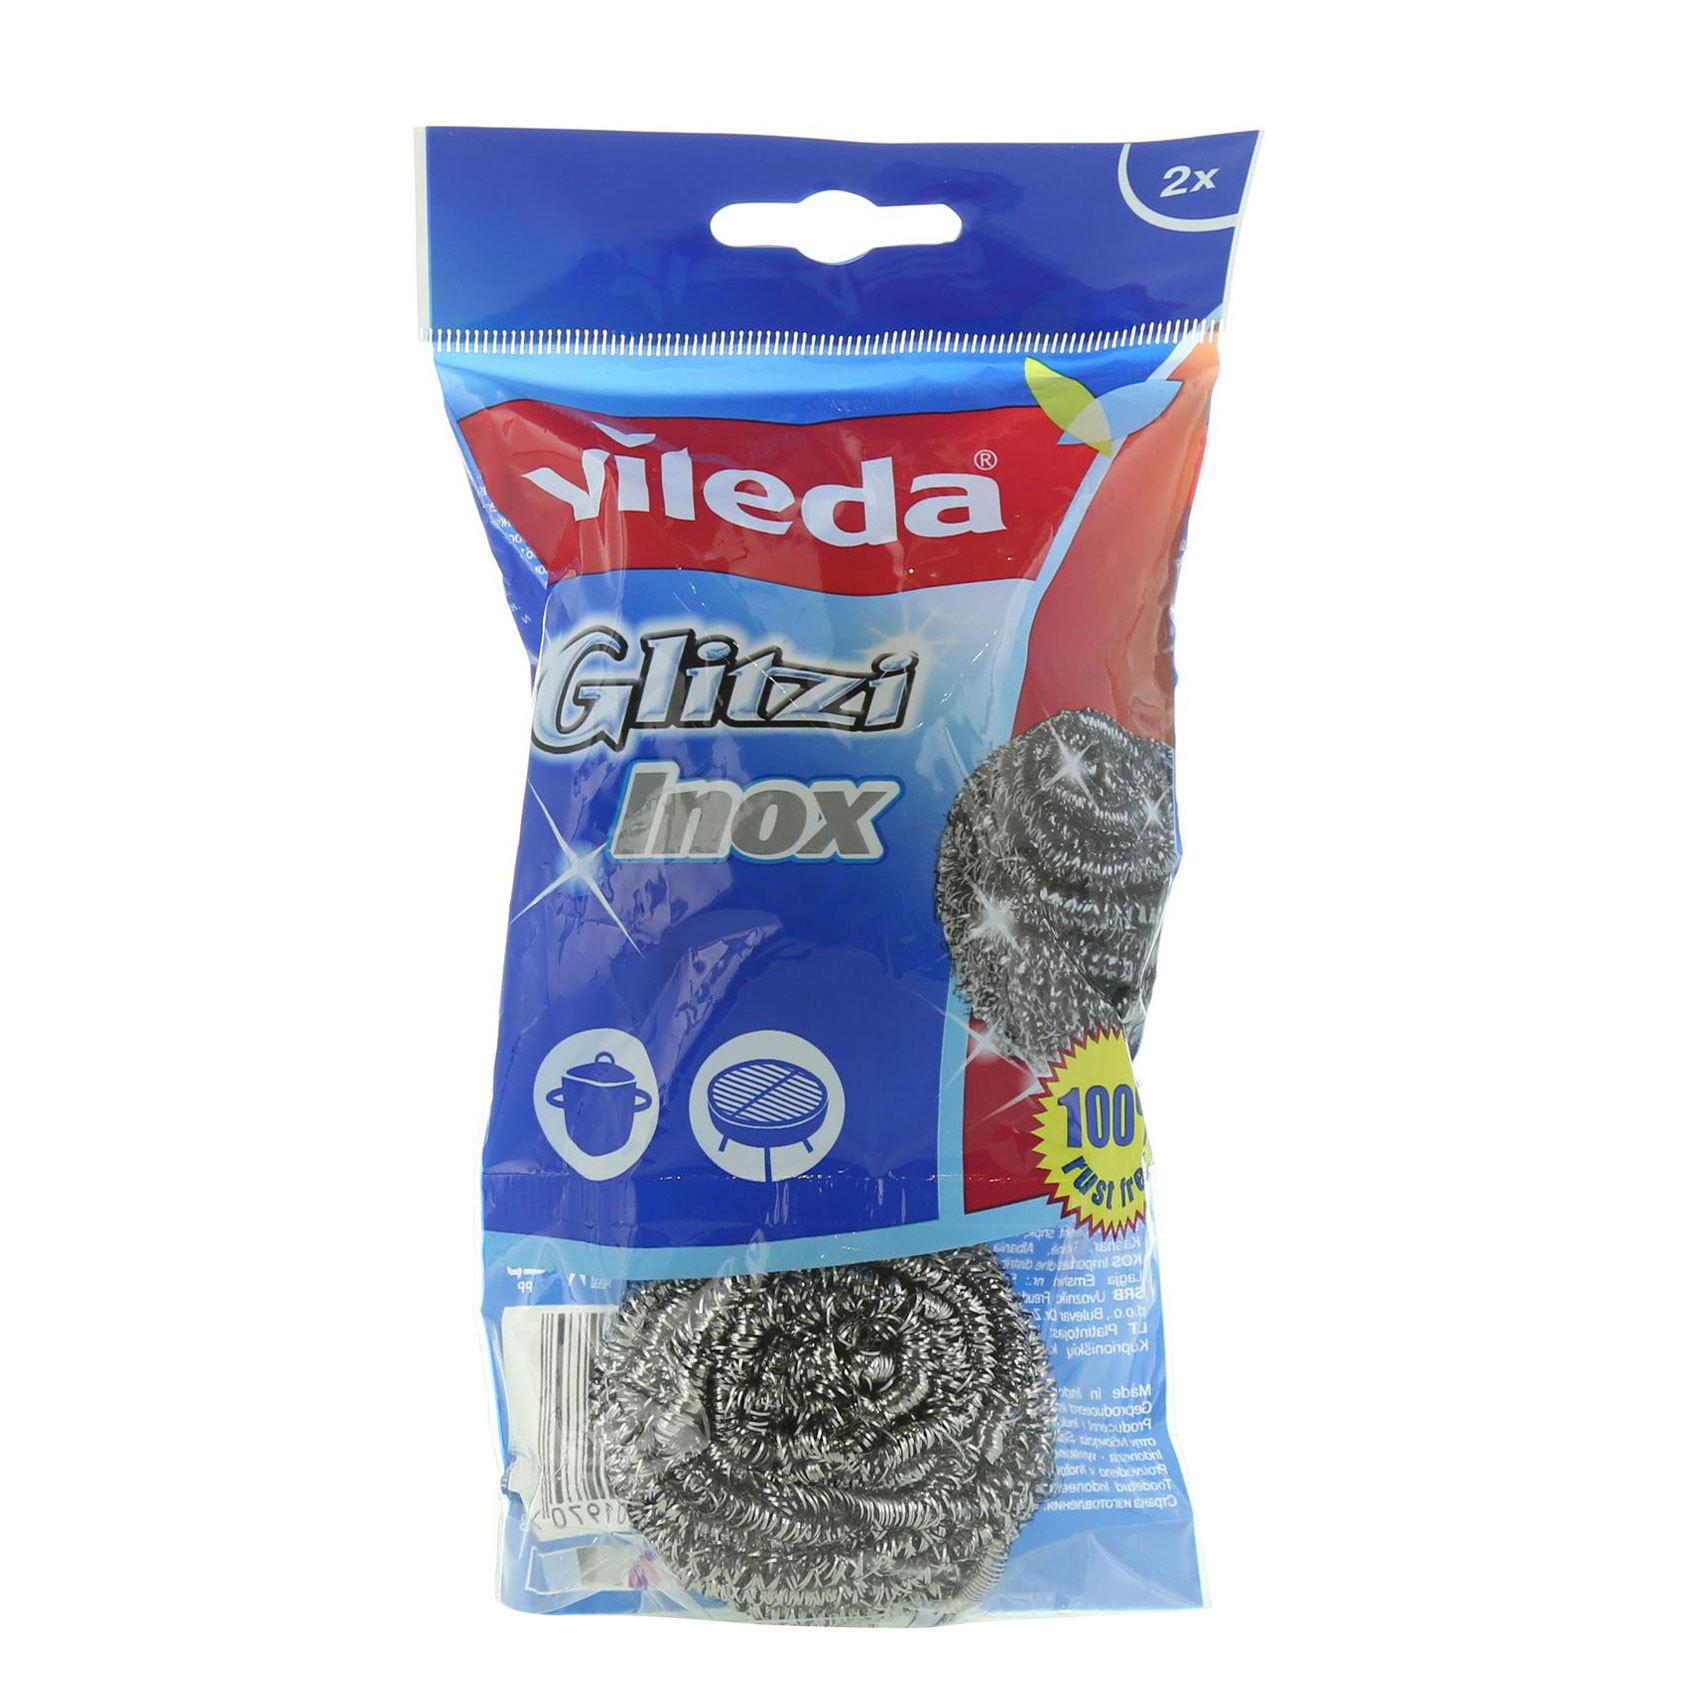 VILEDA SCOURING INOX SPIRAL X2